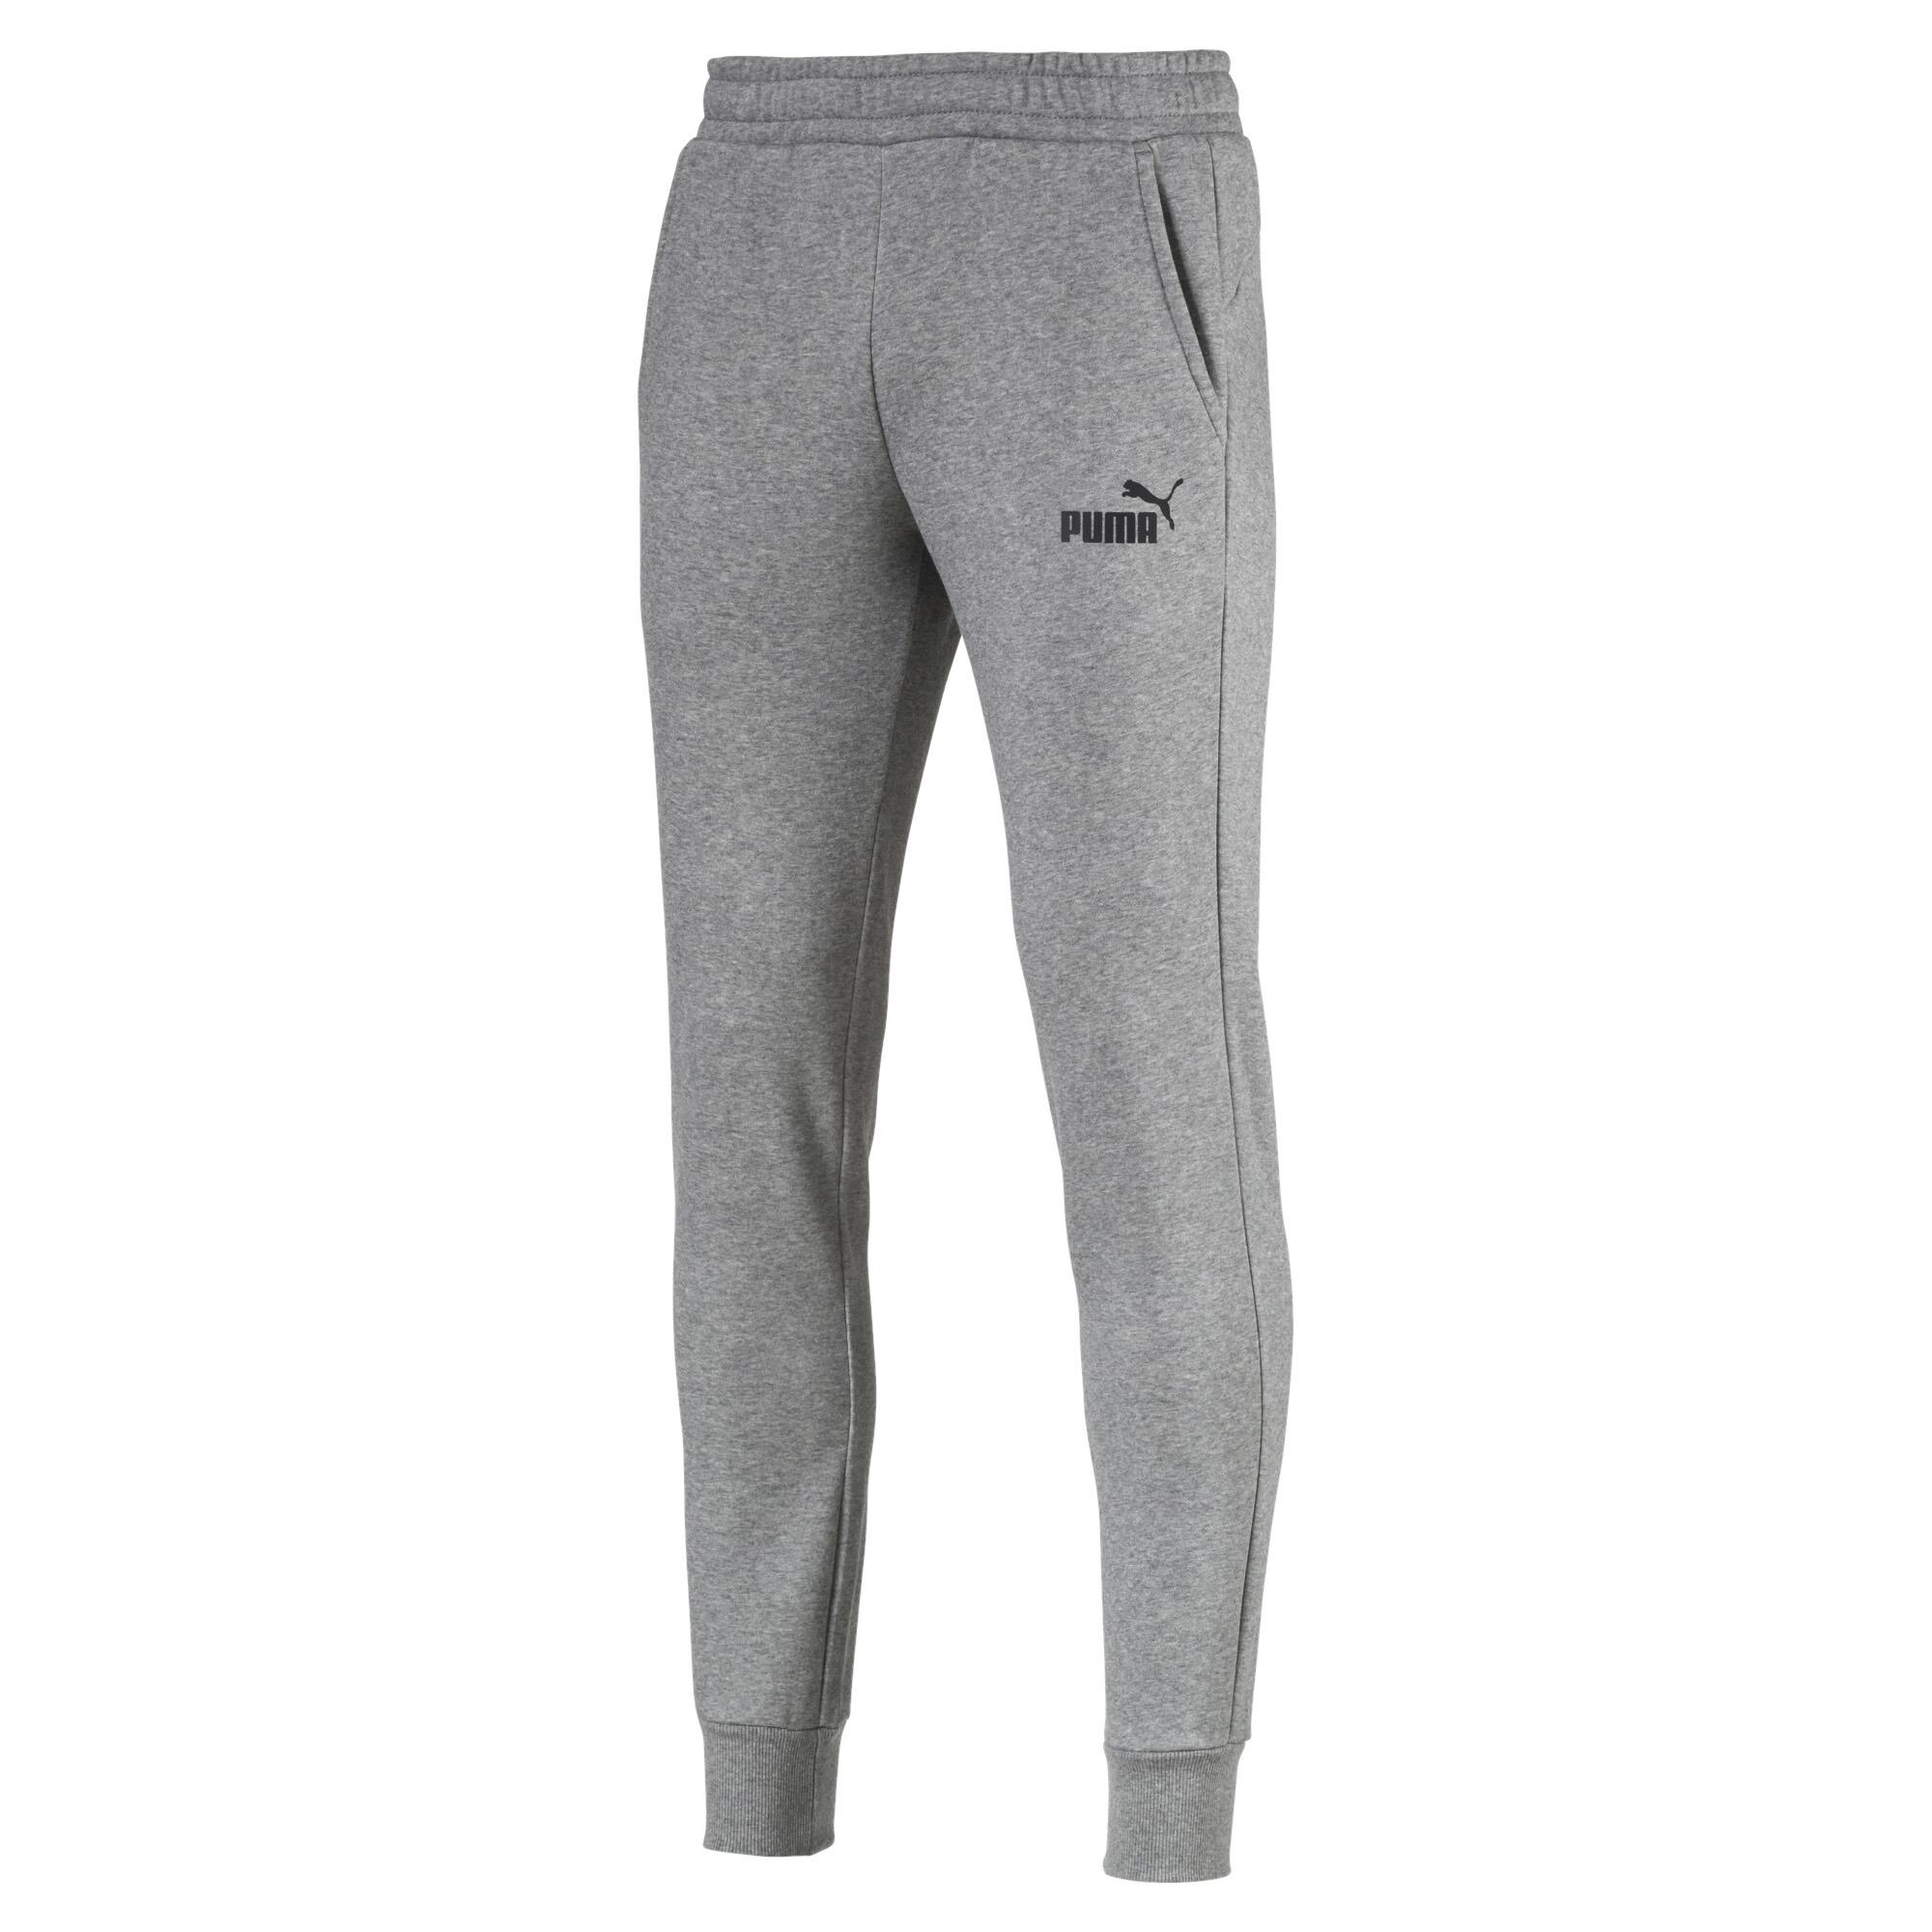 PUMA-Essentials-Men-039-s-Fleece-Knit-Pants-Men-Knitted-Pants-Basics thumbnail 7